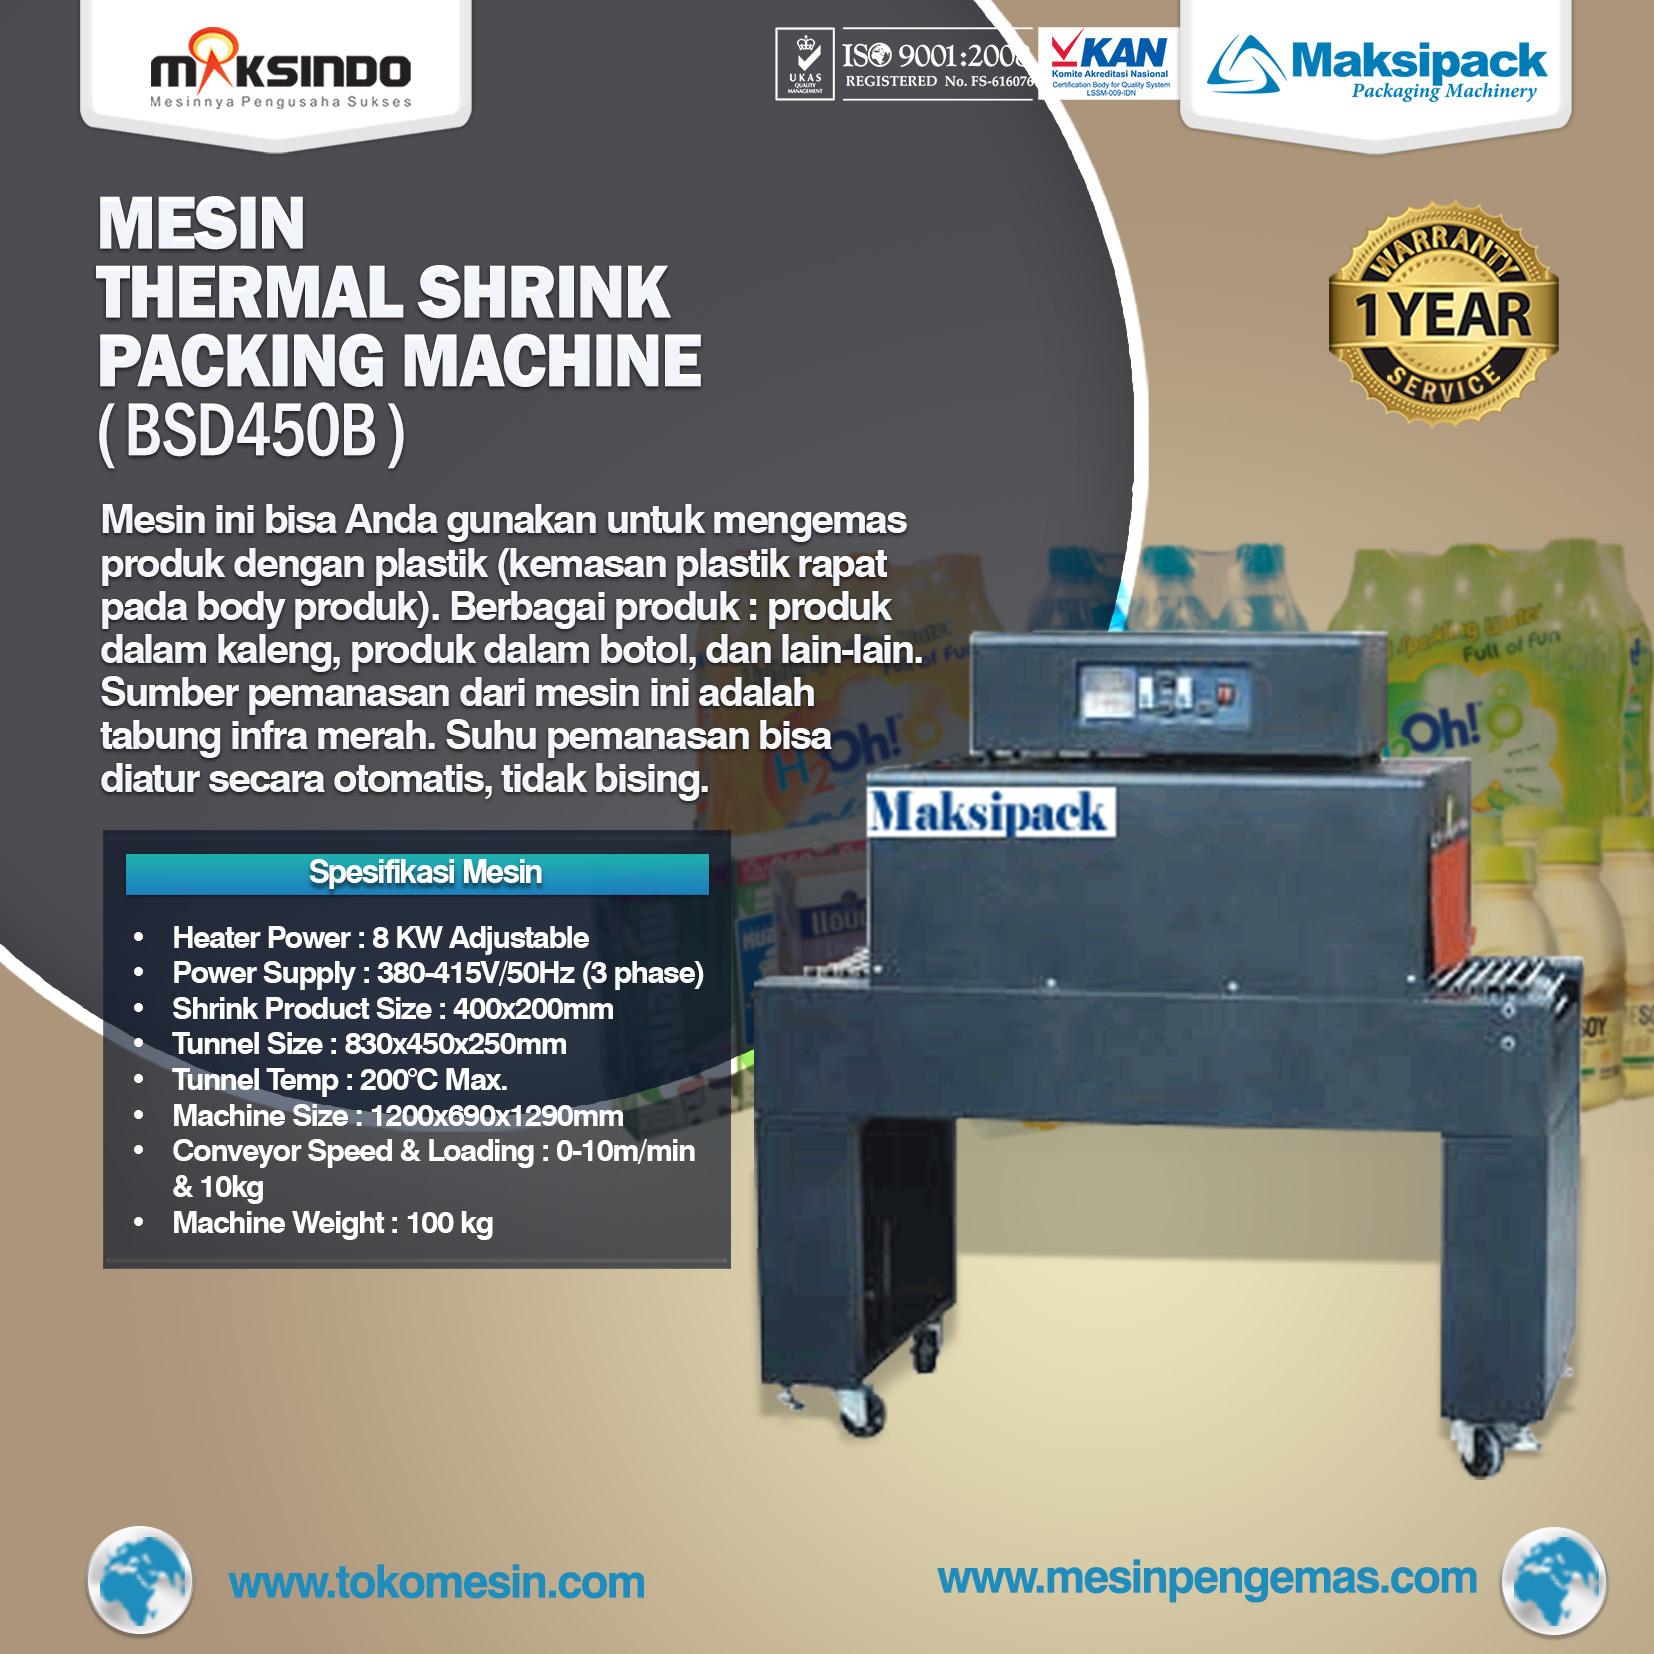 Thermal-Shrink Packing Machine (BSD450B)